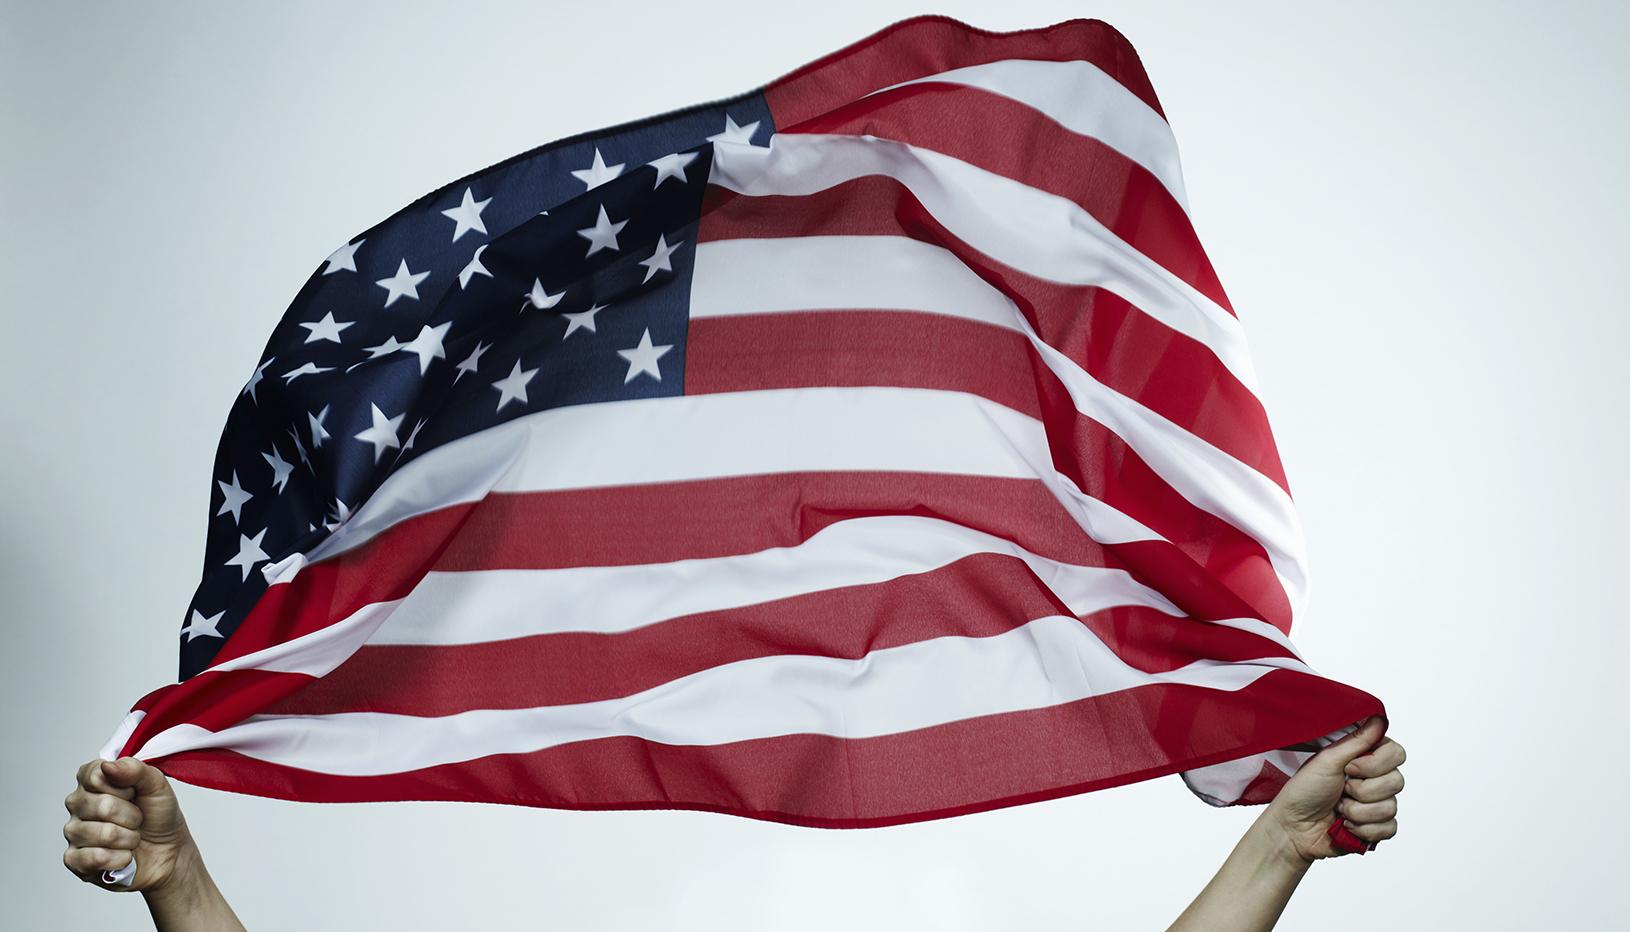 Patriot Games | Brennan Center for Justice